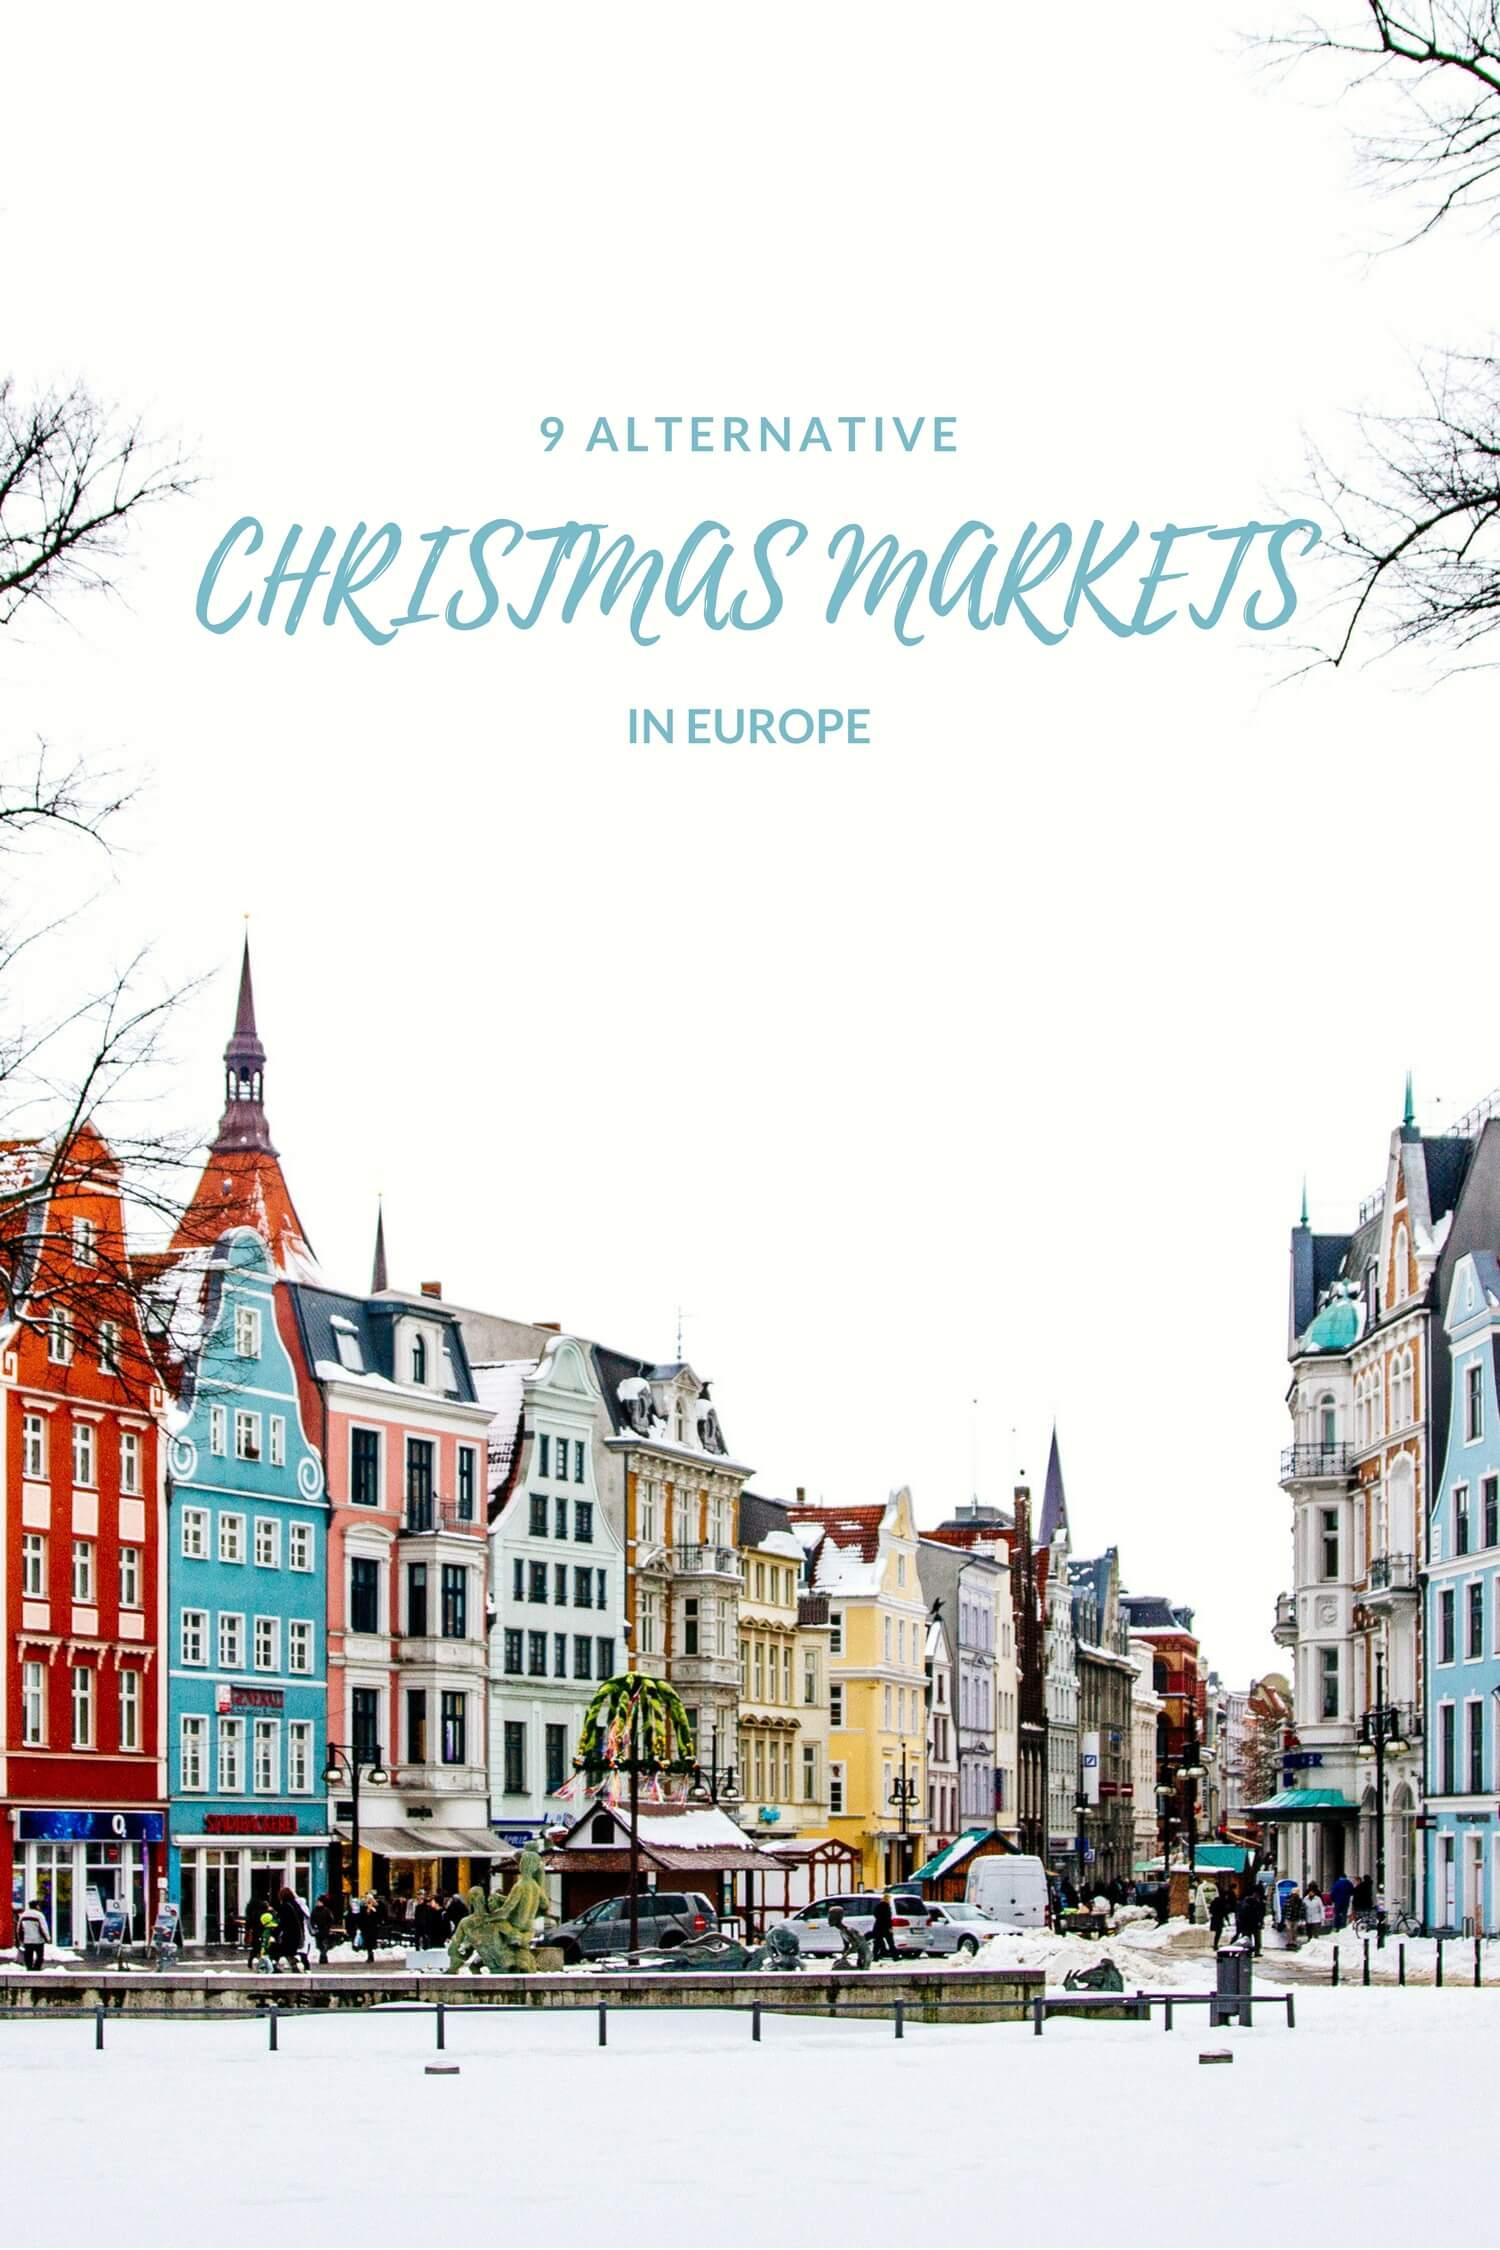 Alternative Christmas Markets in Europe